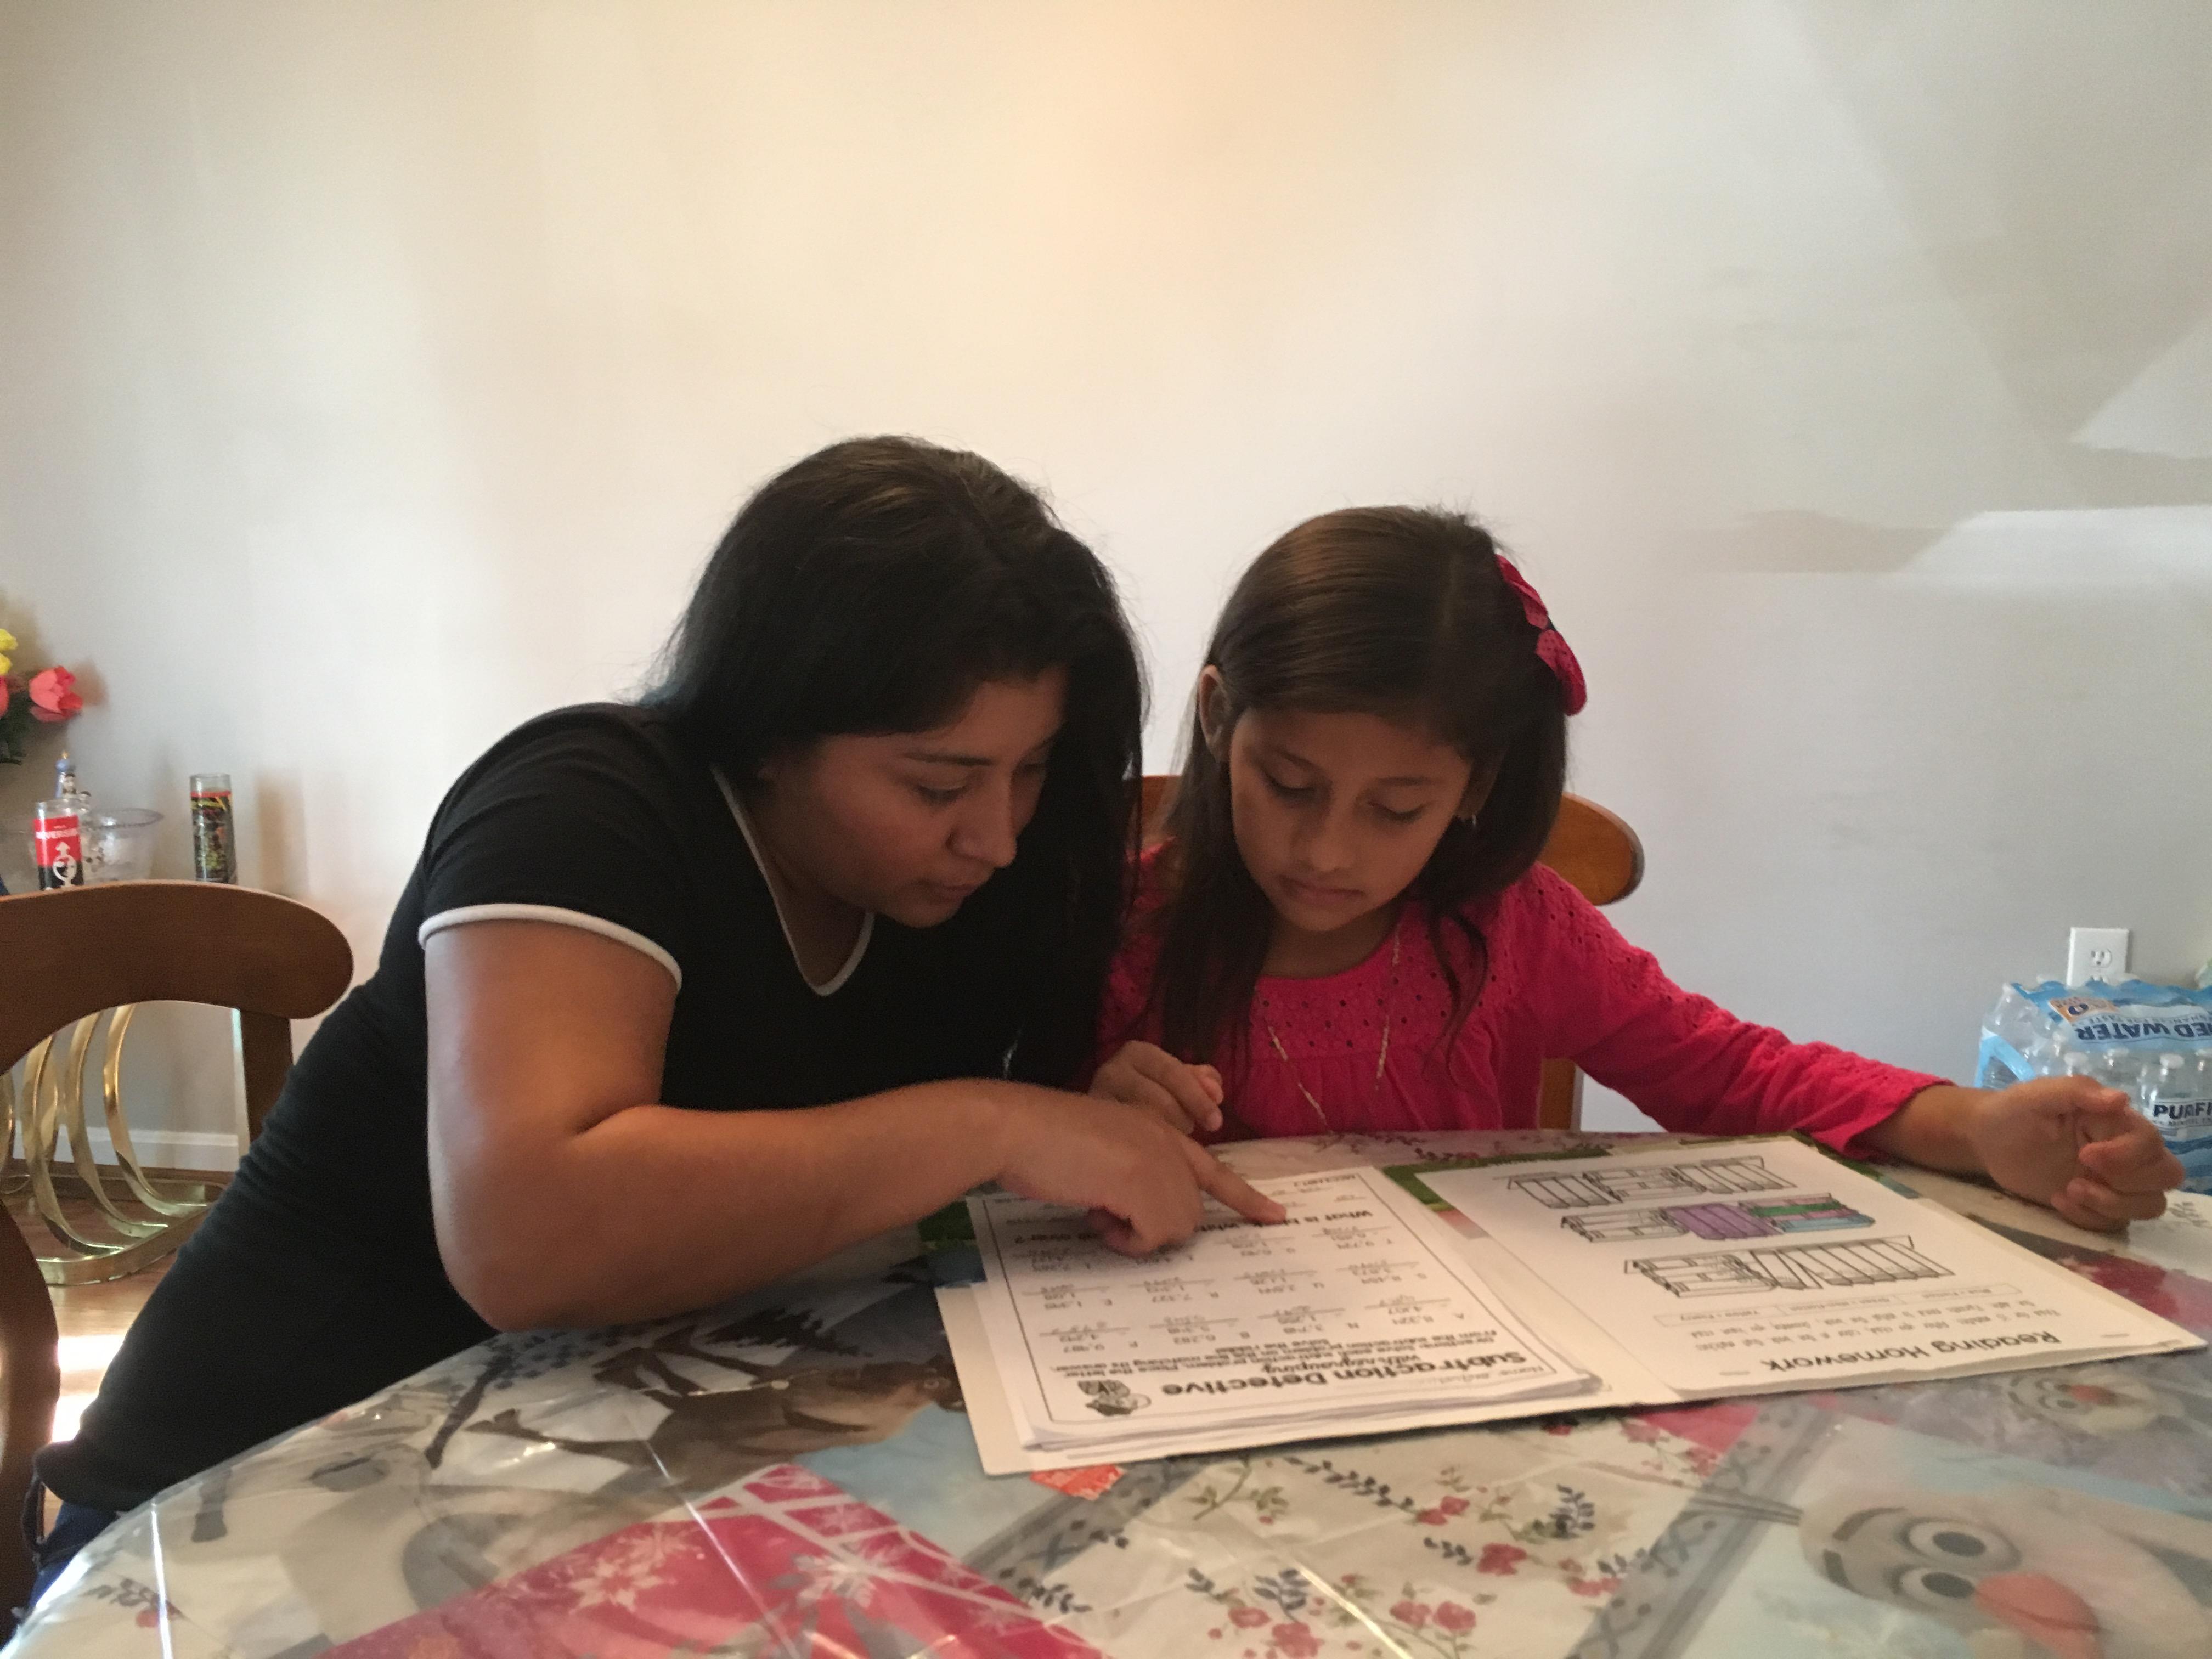 Madre e hija revisando la tarea.